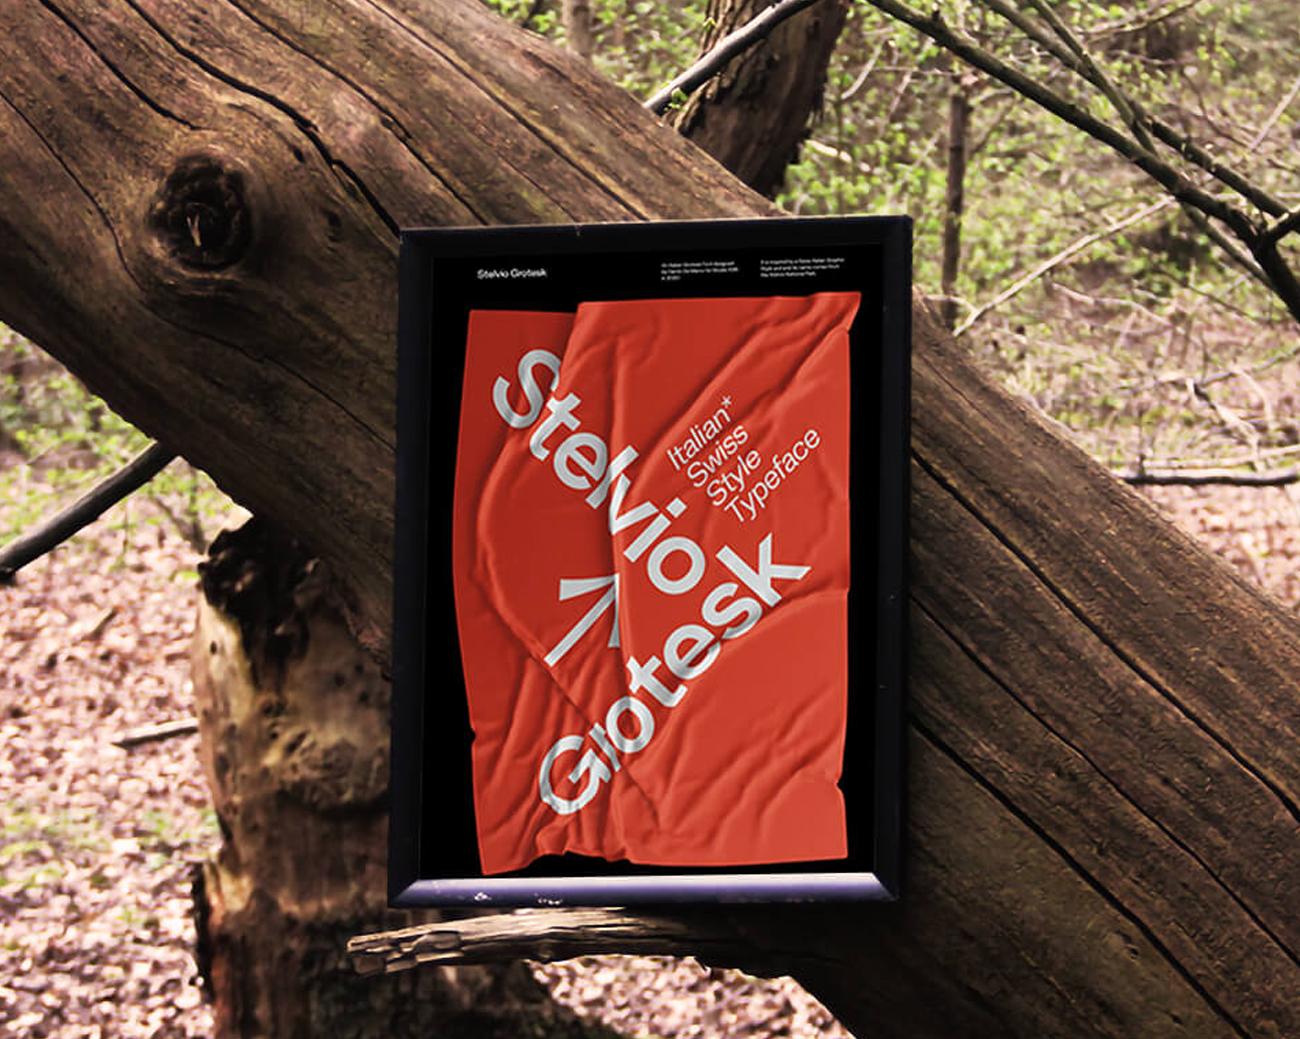 10 Posters that Promote Stelvio Grotesk